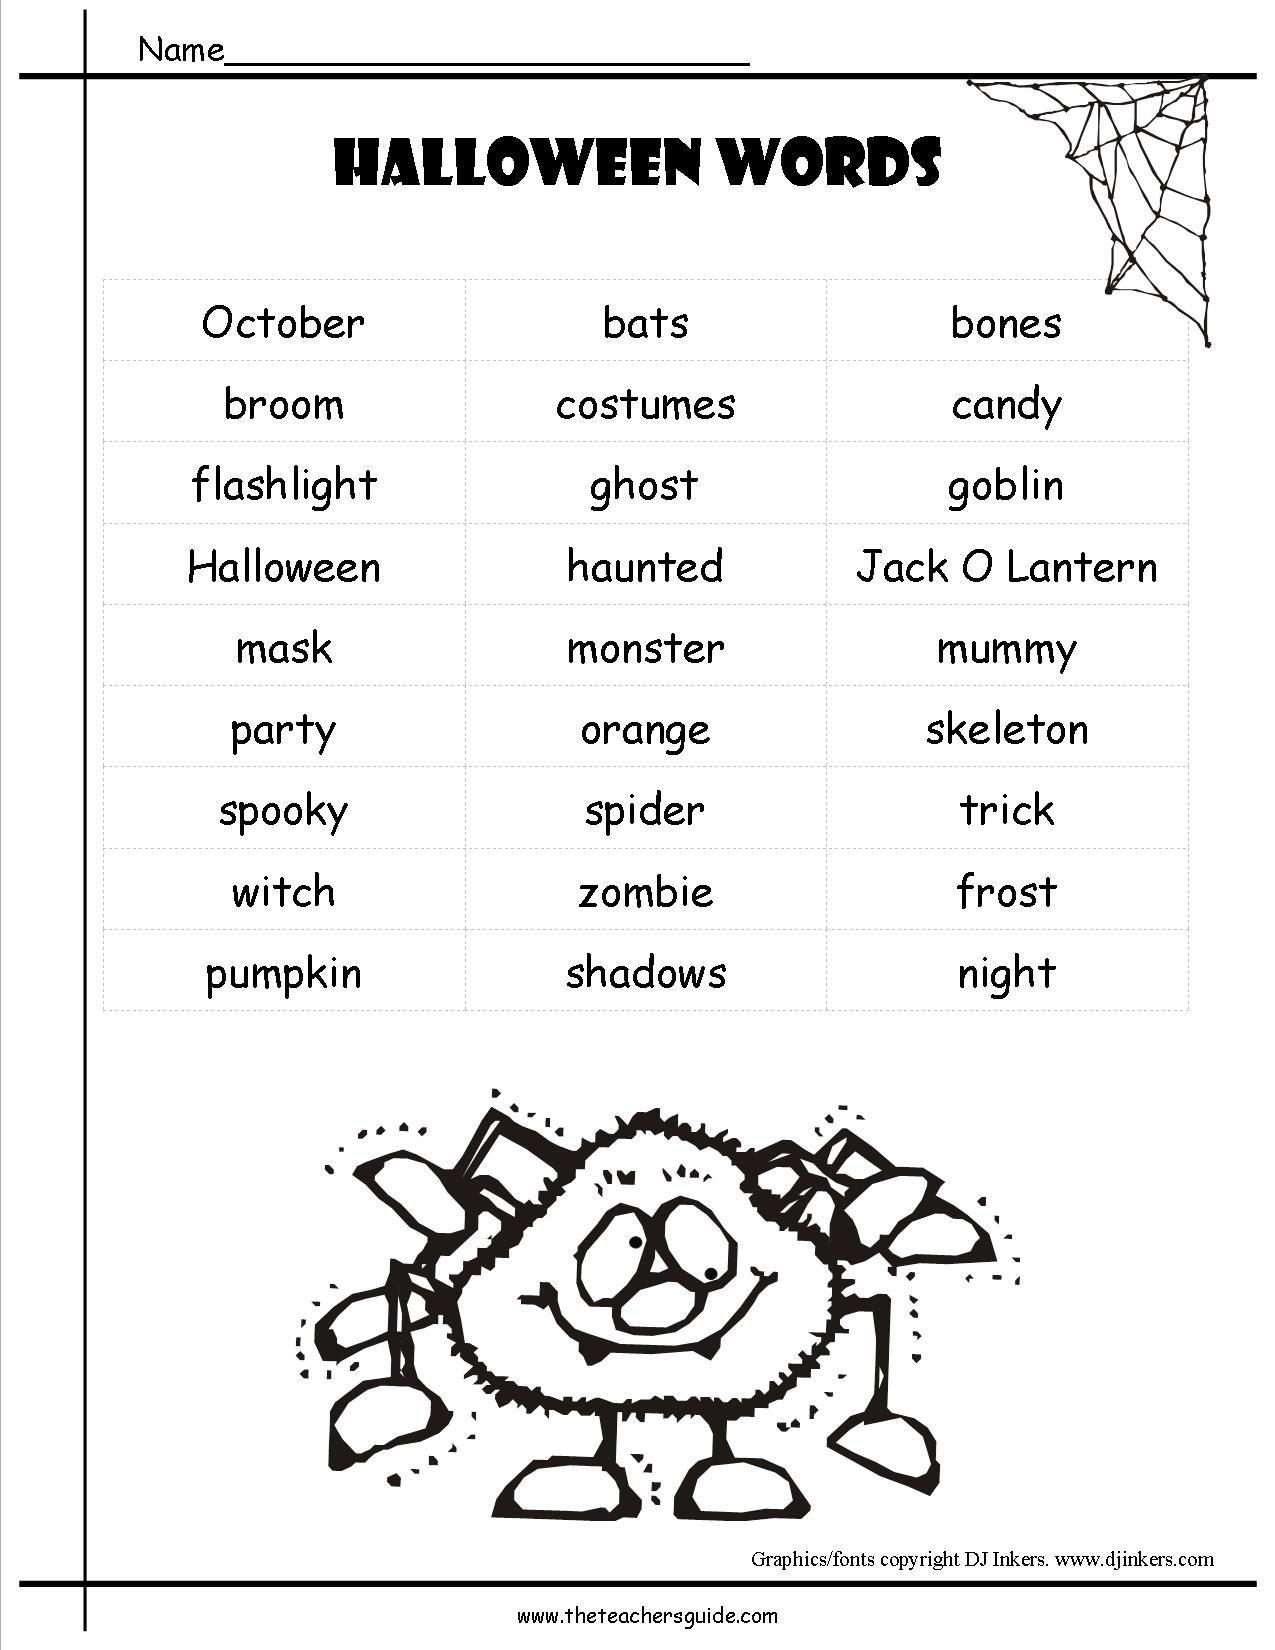 medium resolution of Halloween Printouts from The Teacher\u0026#39;s Guide   Halloween worksheets